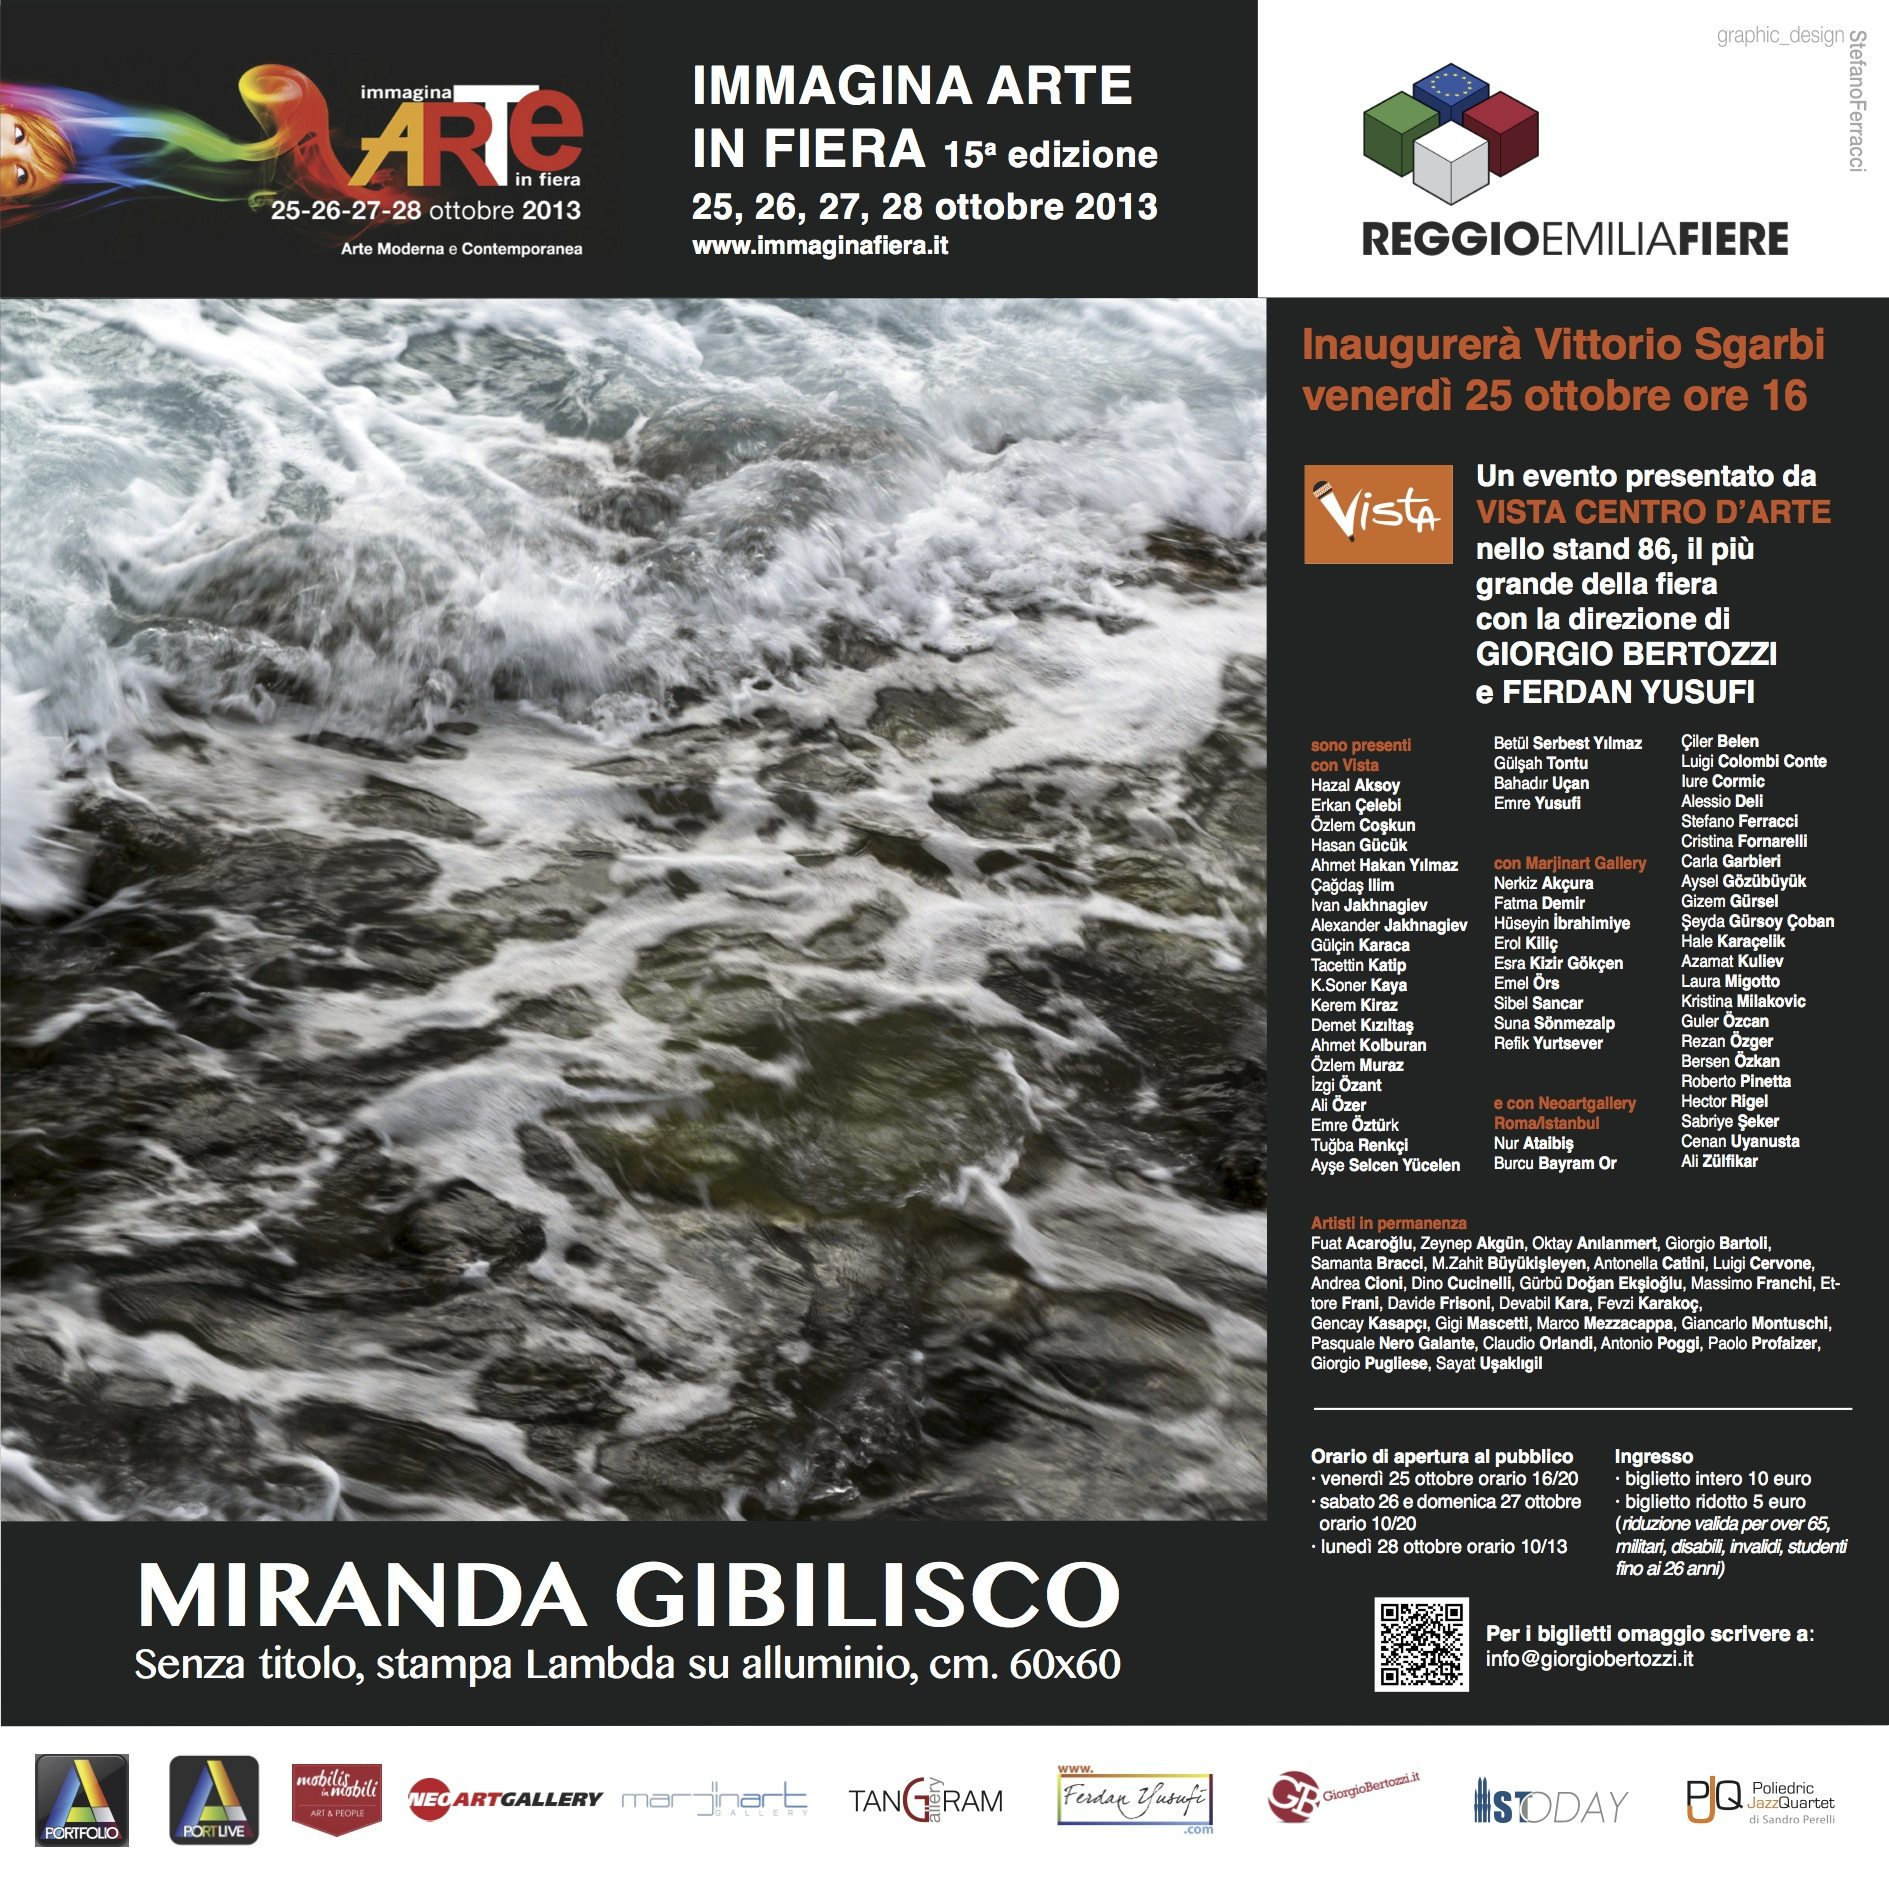 Miranda Gibilisco Giorgio Bertozzi Neoartgallery